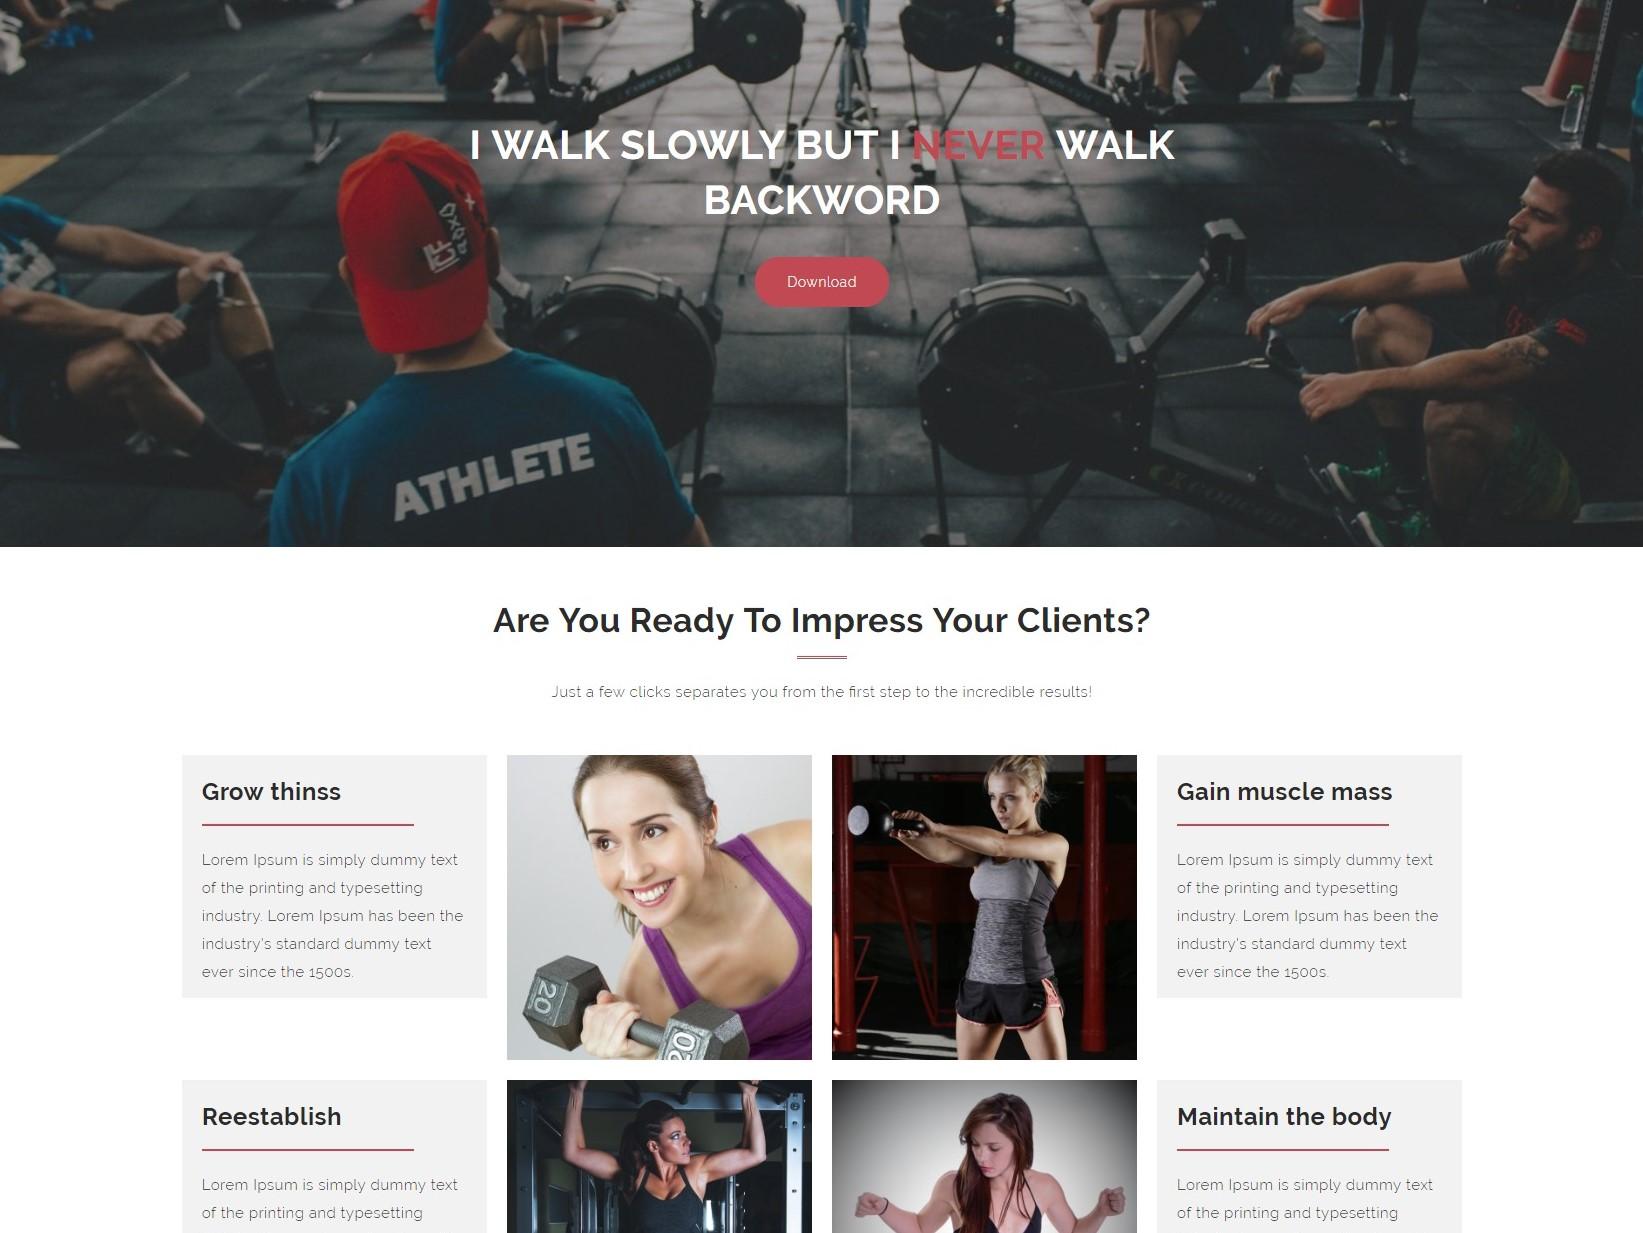 Fitness Freak - Free fitness Wordpress theme - Geethemes